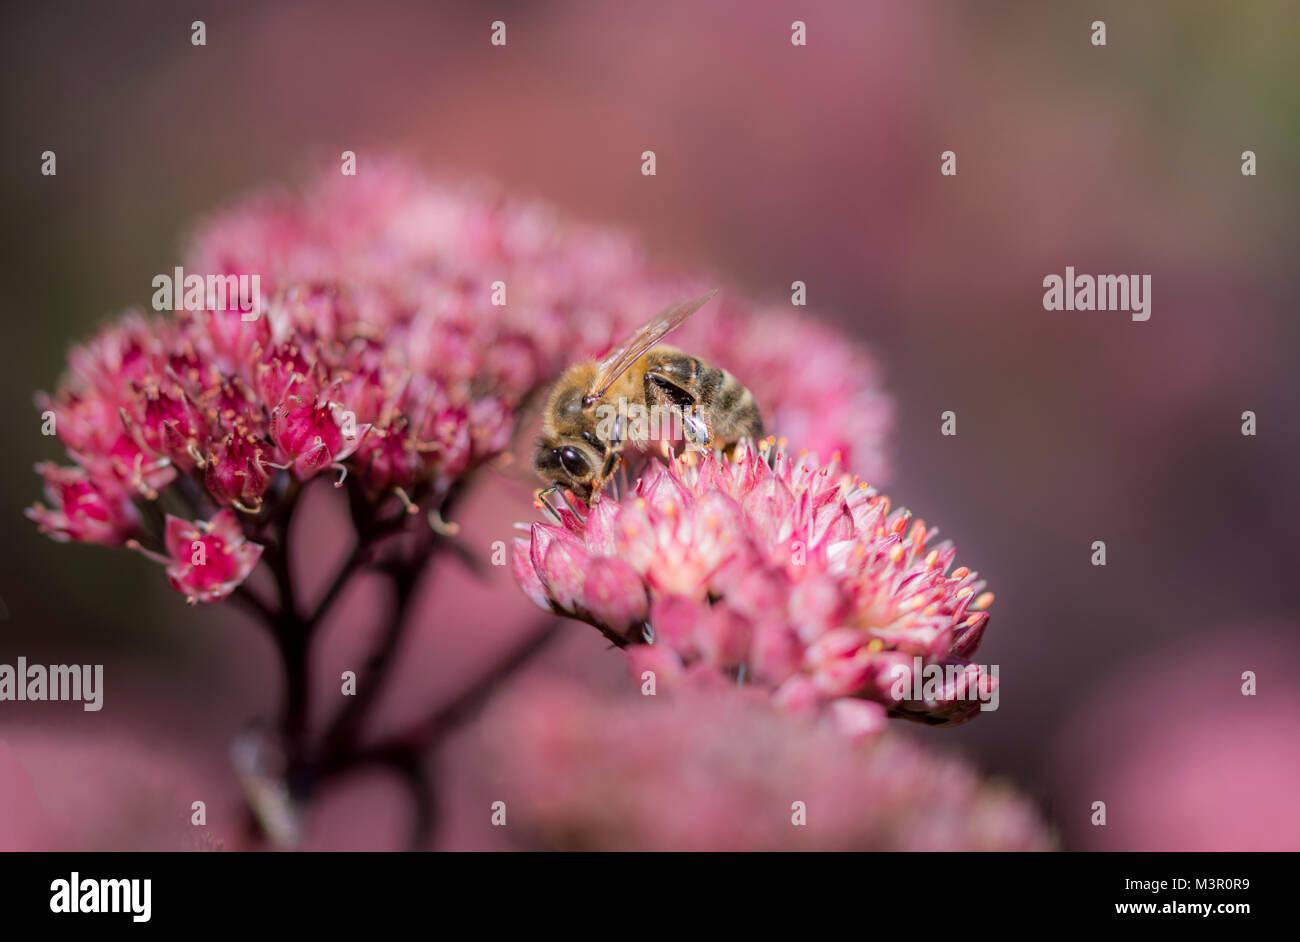 Honey bee on pink flower soft focus - Stock Image